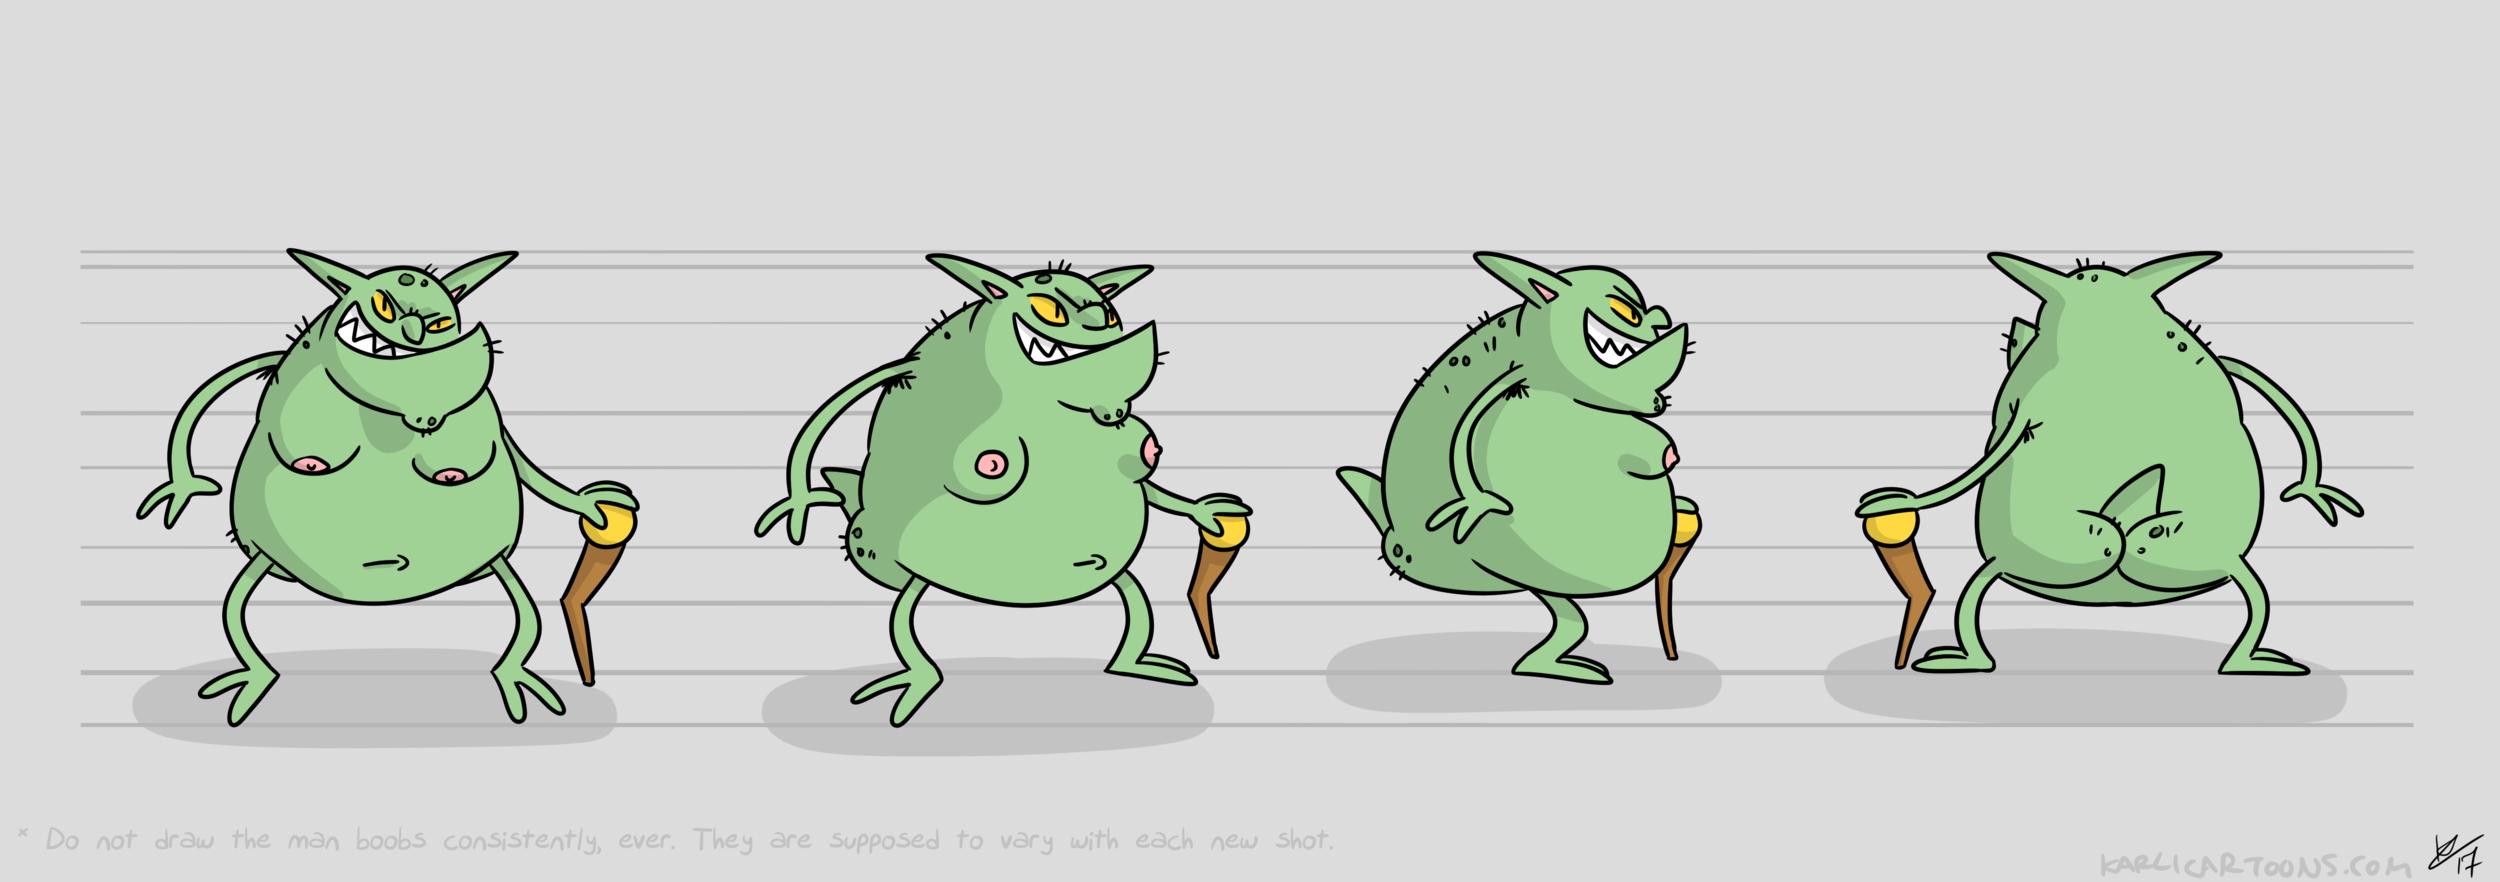 Troll Turaround KarliCartoons.png